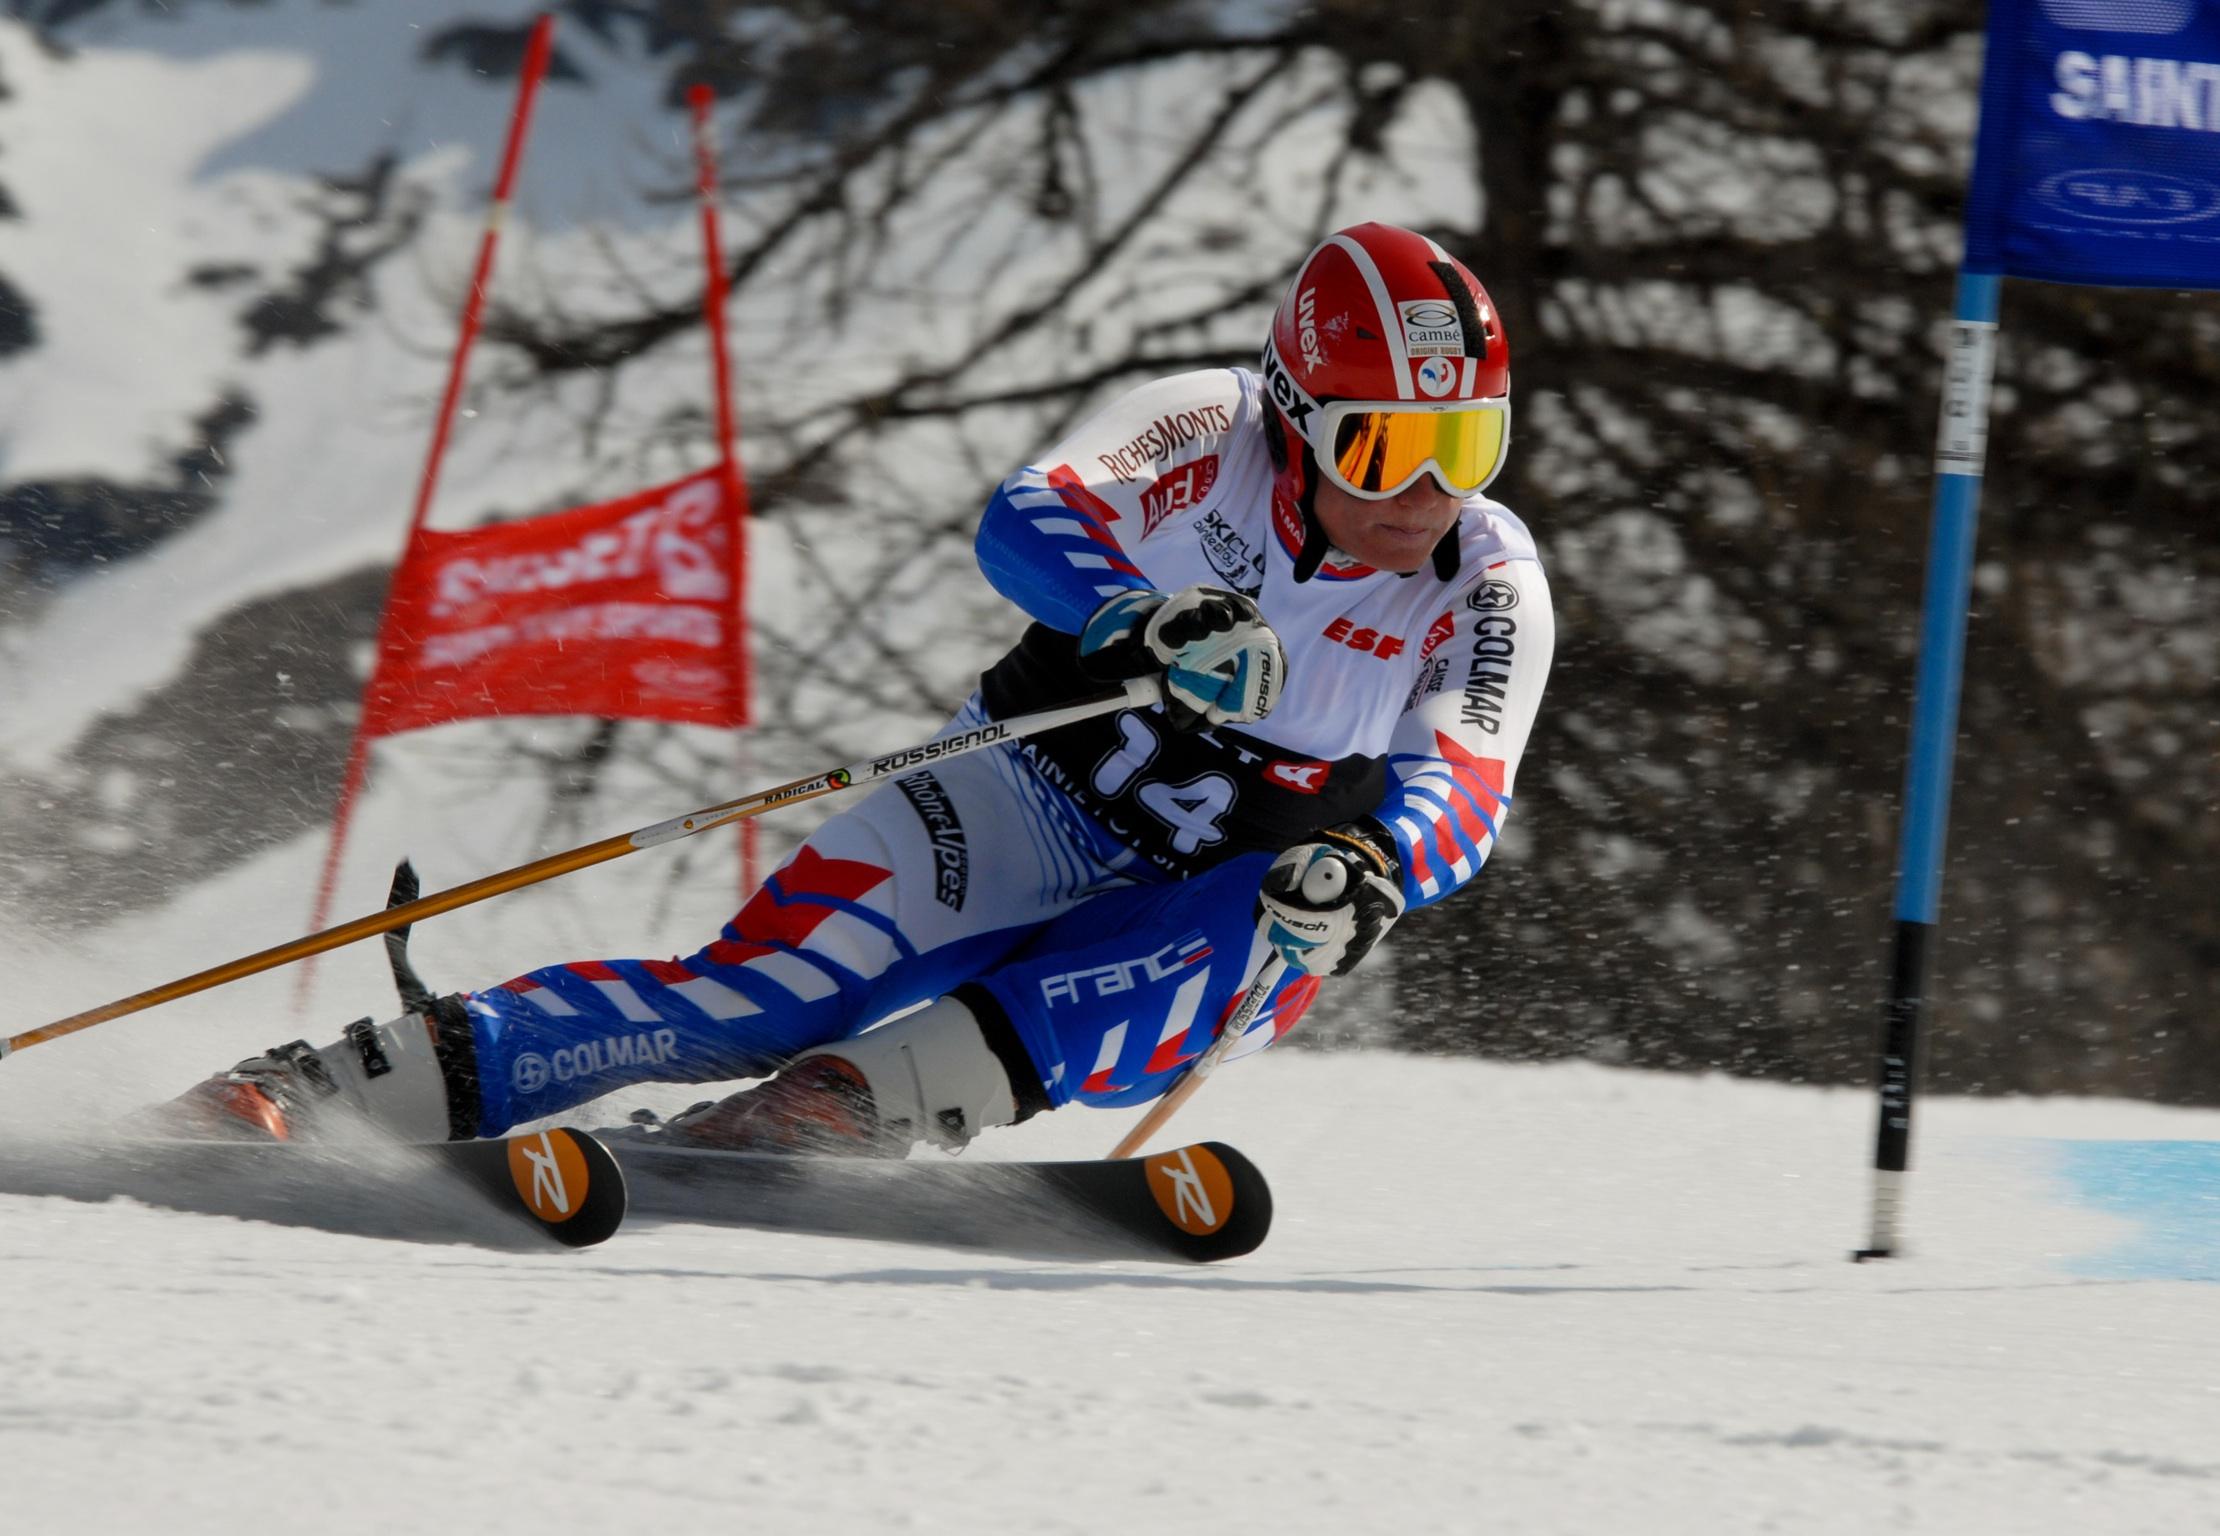 GUILLAUME GRAND Géant championnat france ski porte